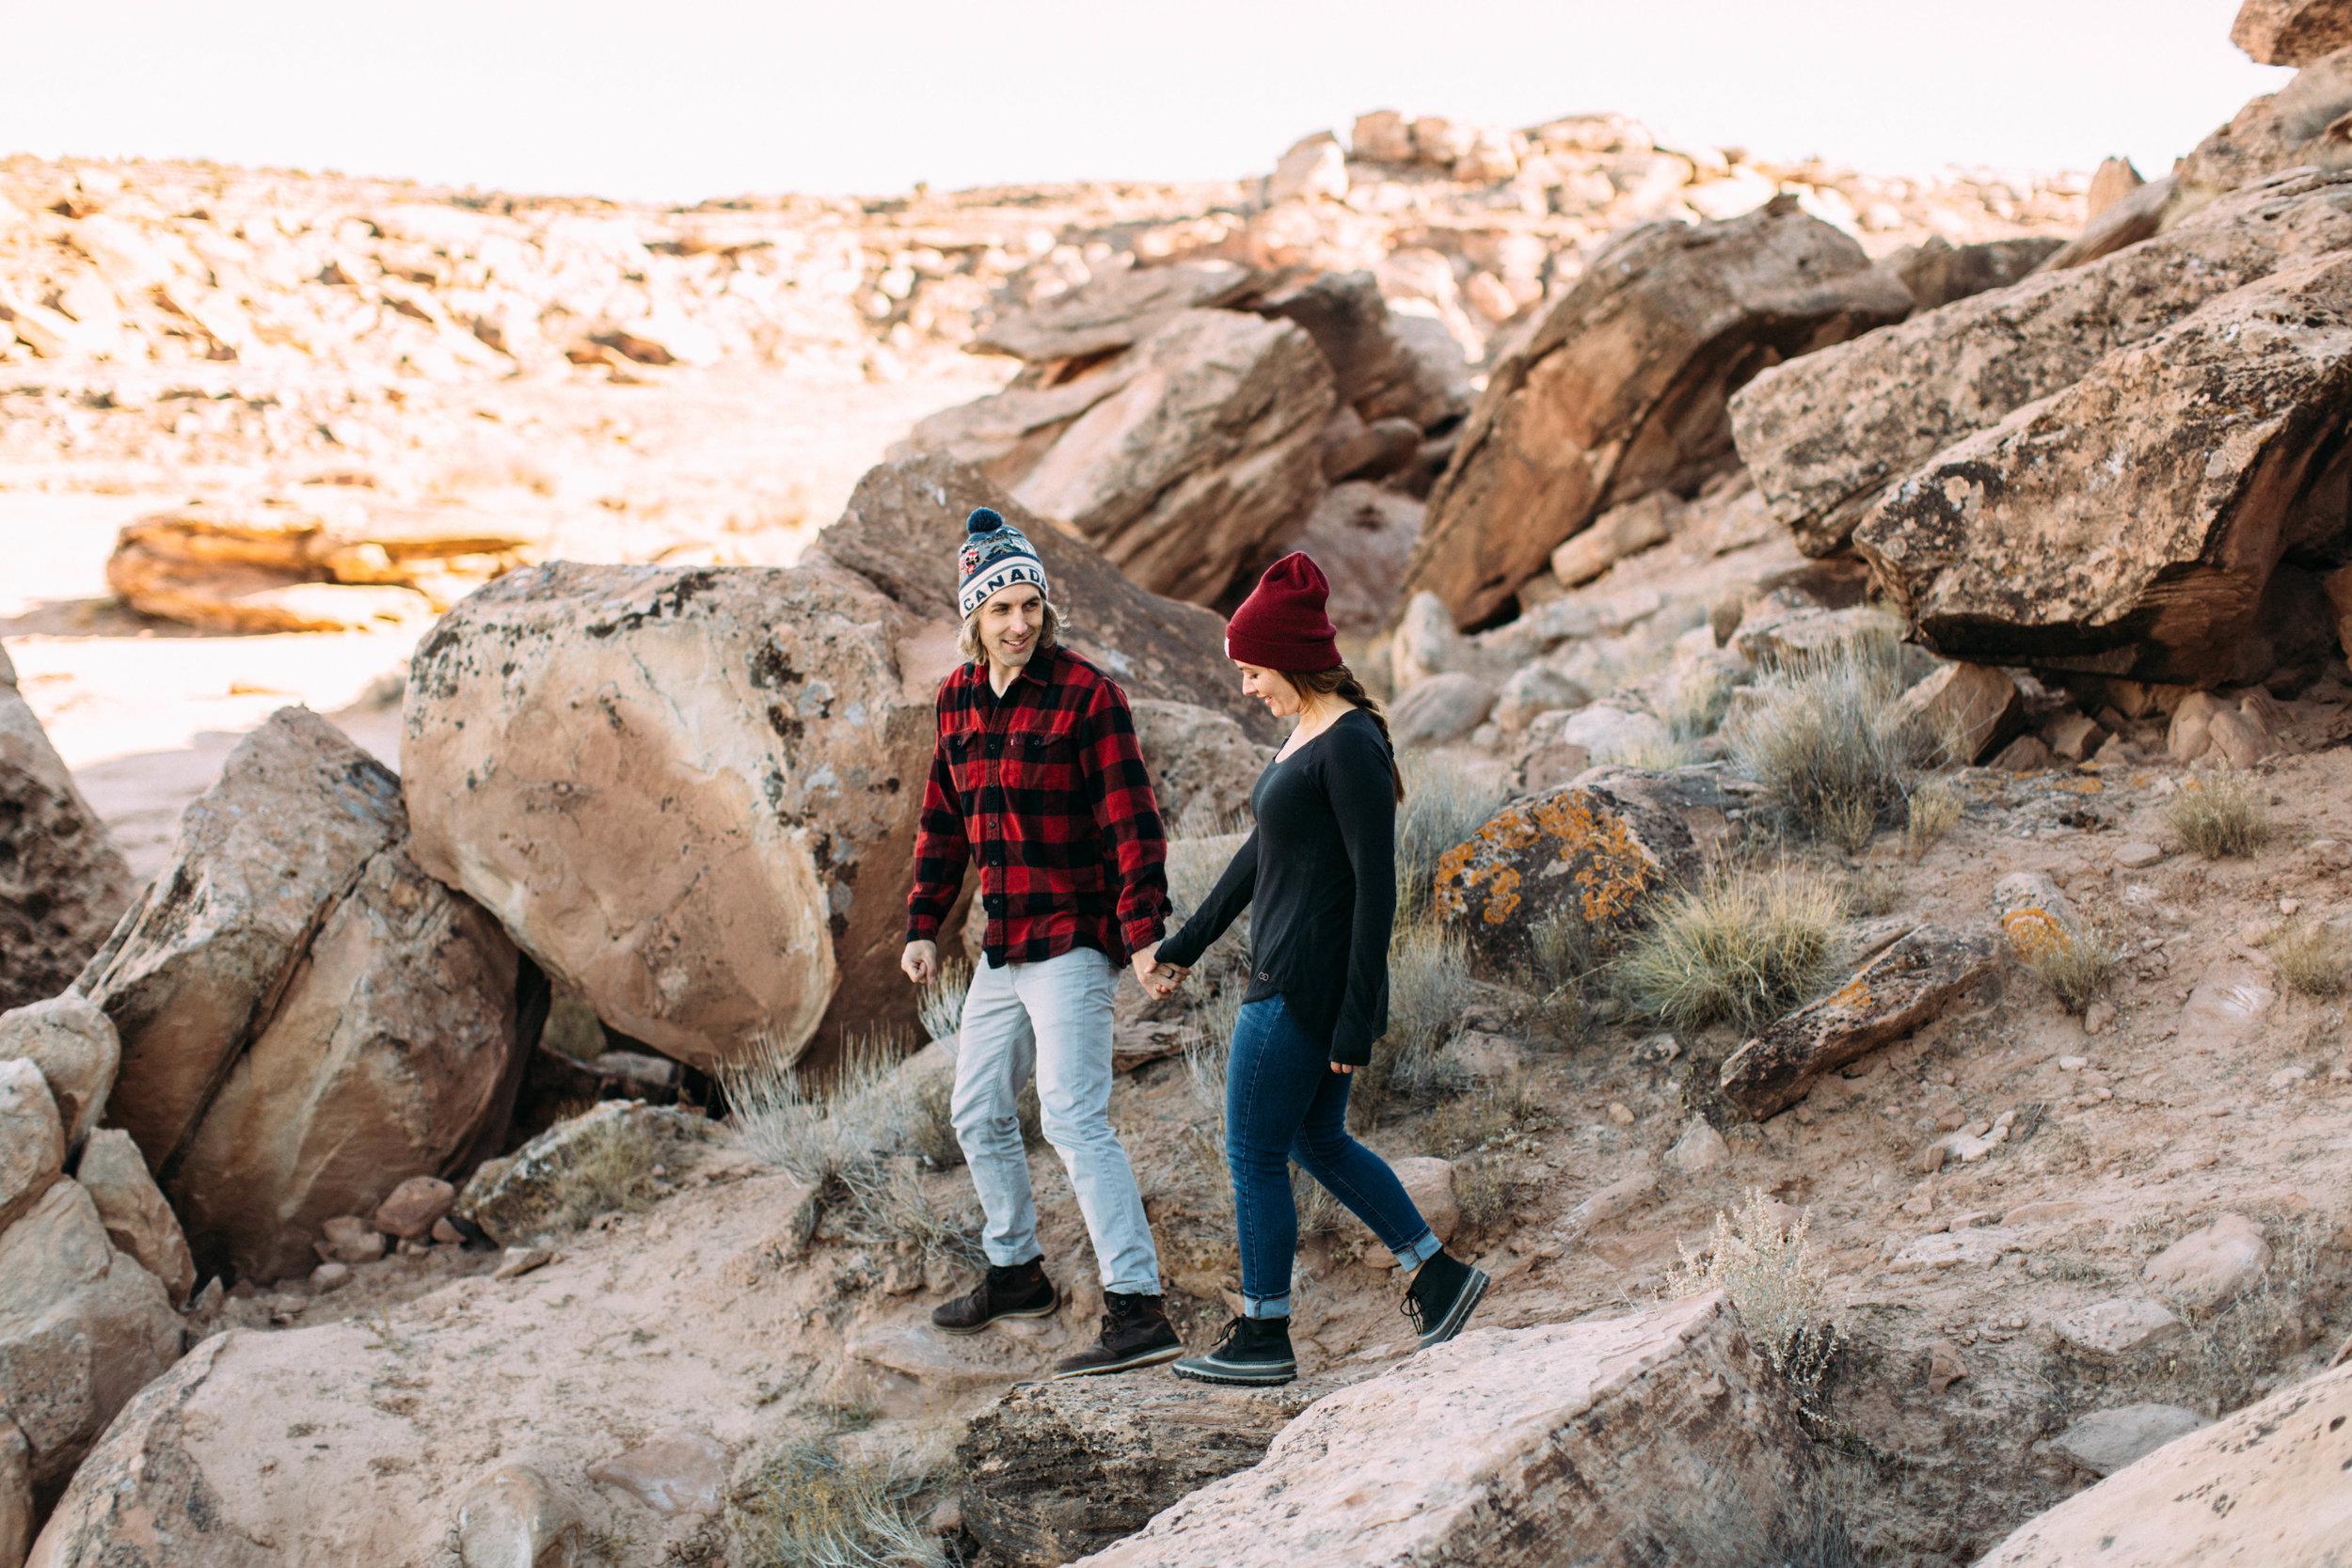 Engaged-Couple-Vanlifers-Hiking.jpg